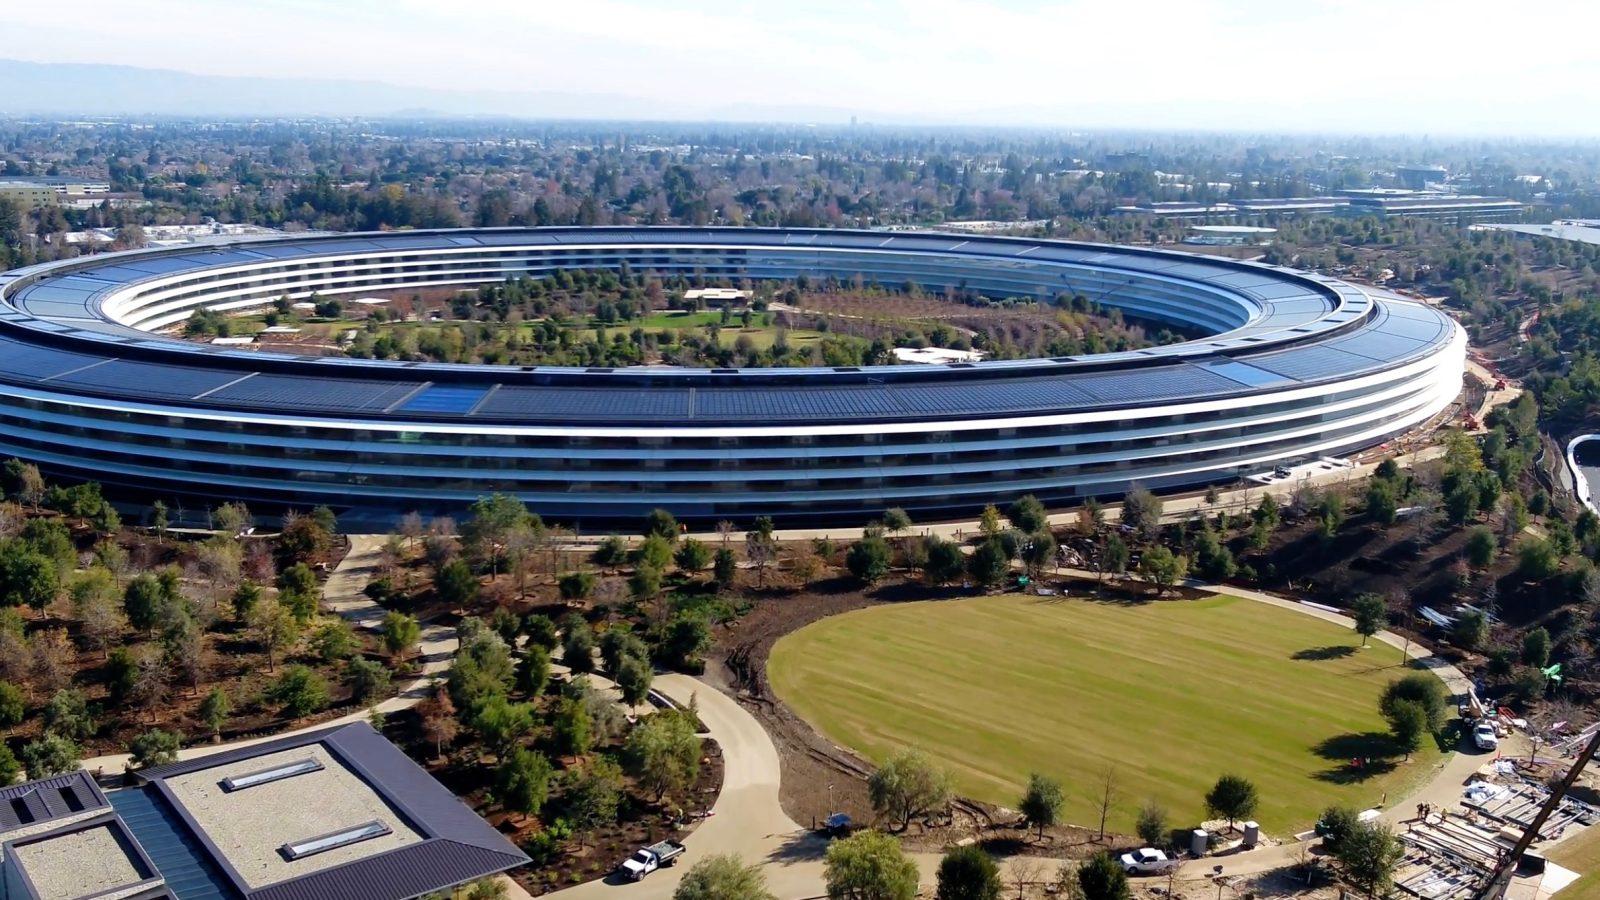 Apple Headquarters Building Design Review